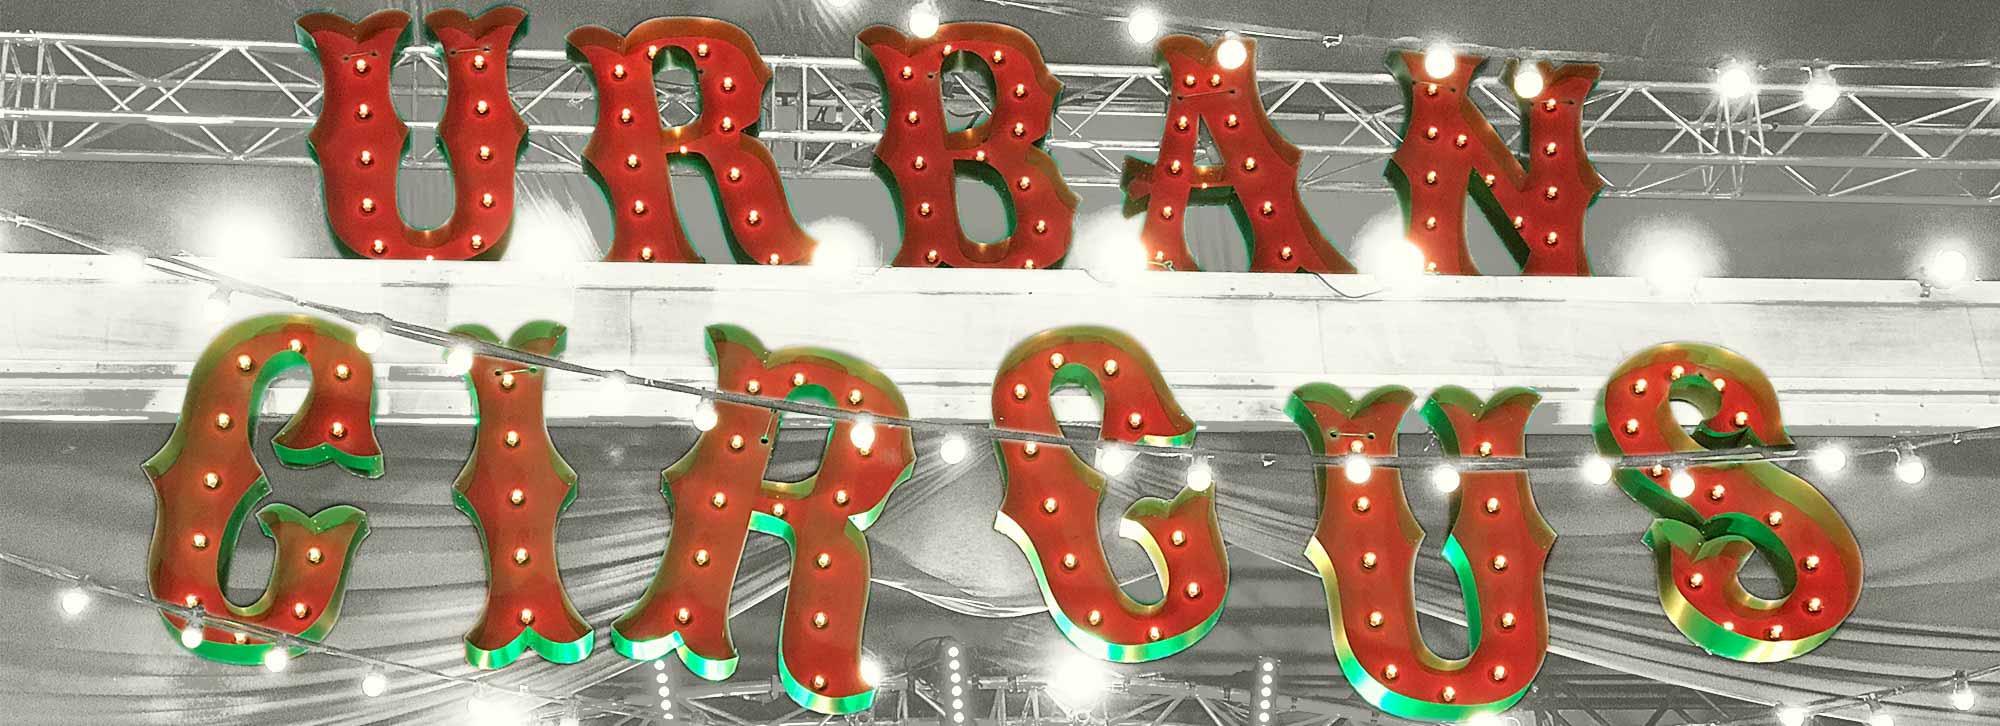 Prefab gemaakte letters 'Urban Circus' voor New Horizons.